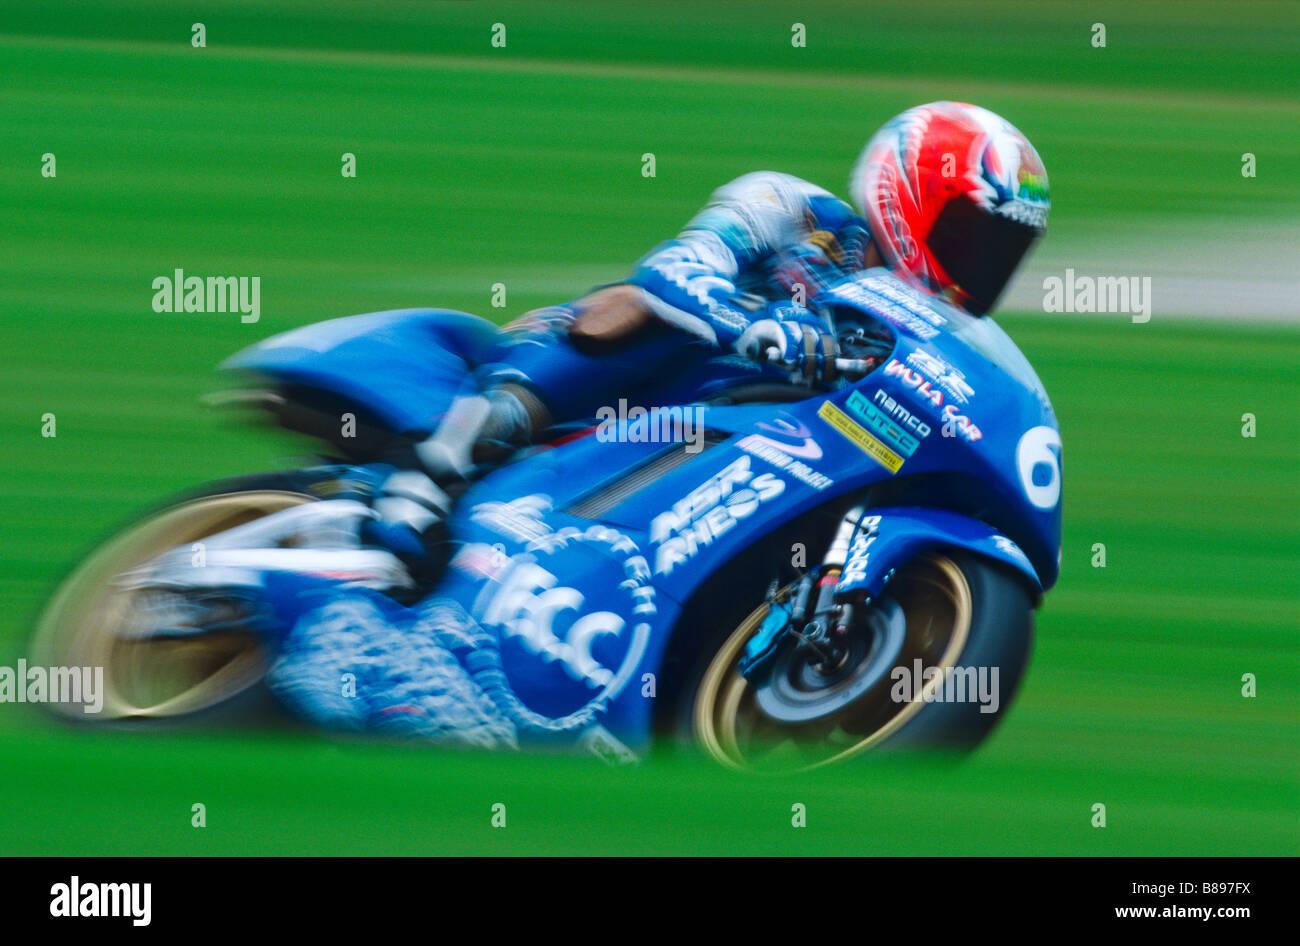 MOTO GP RACE - Stock Image